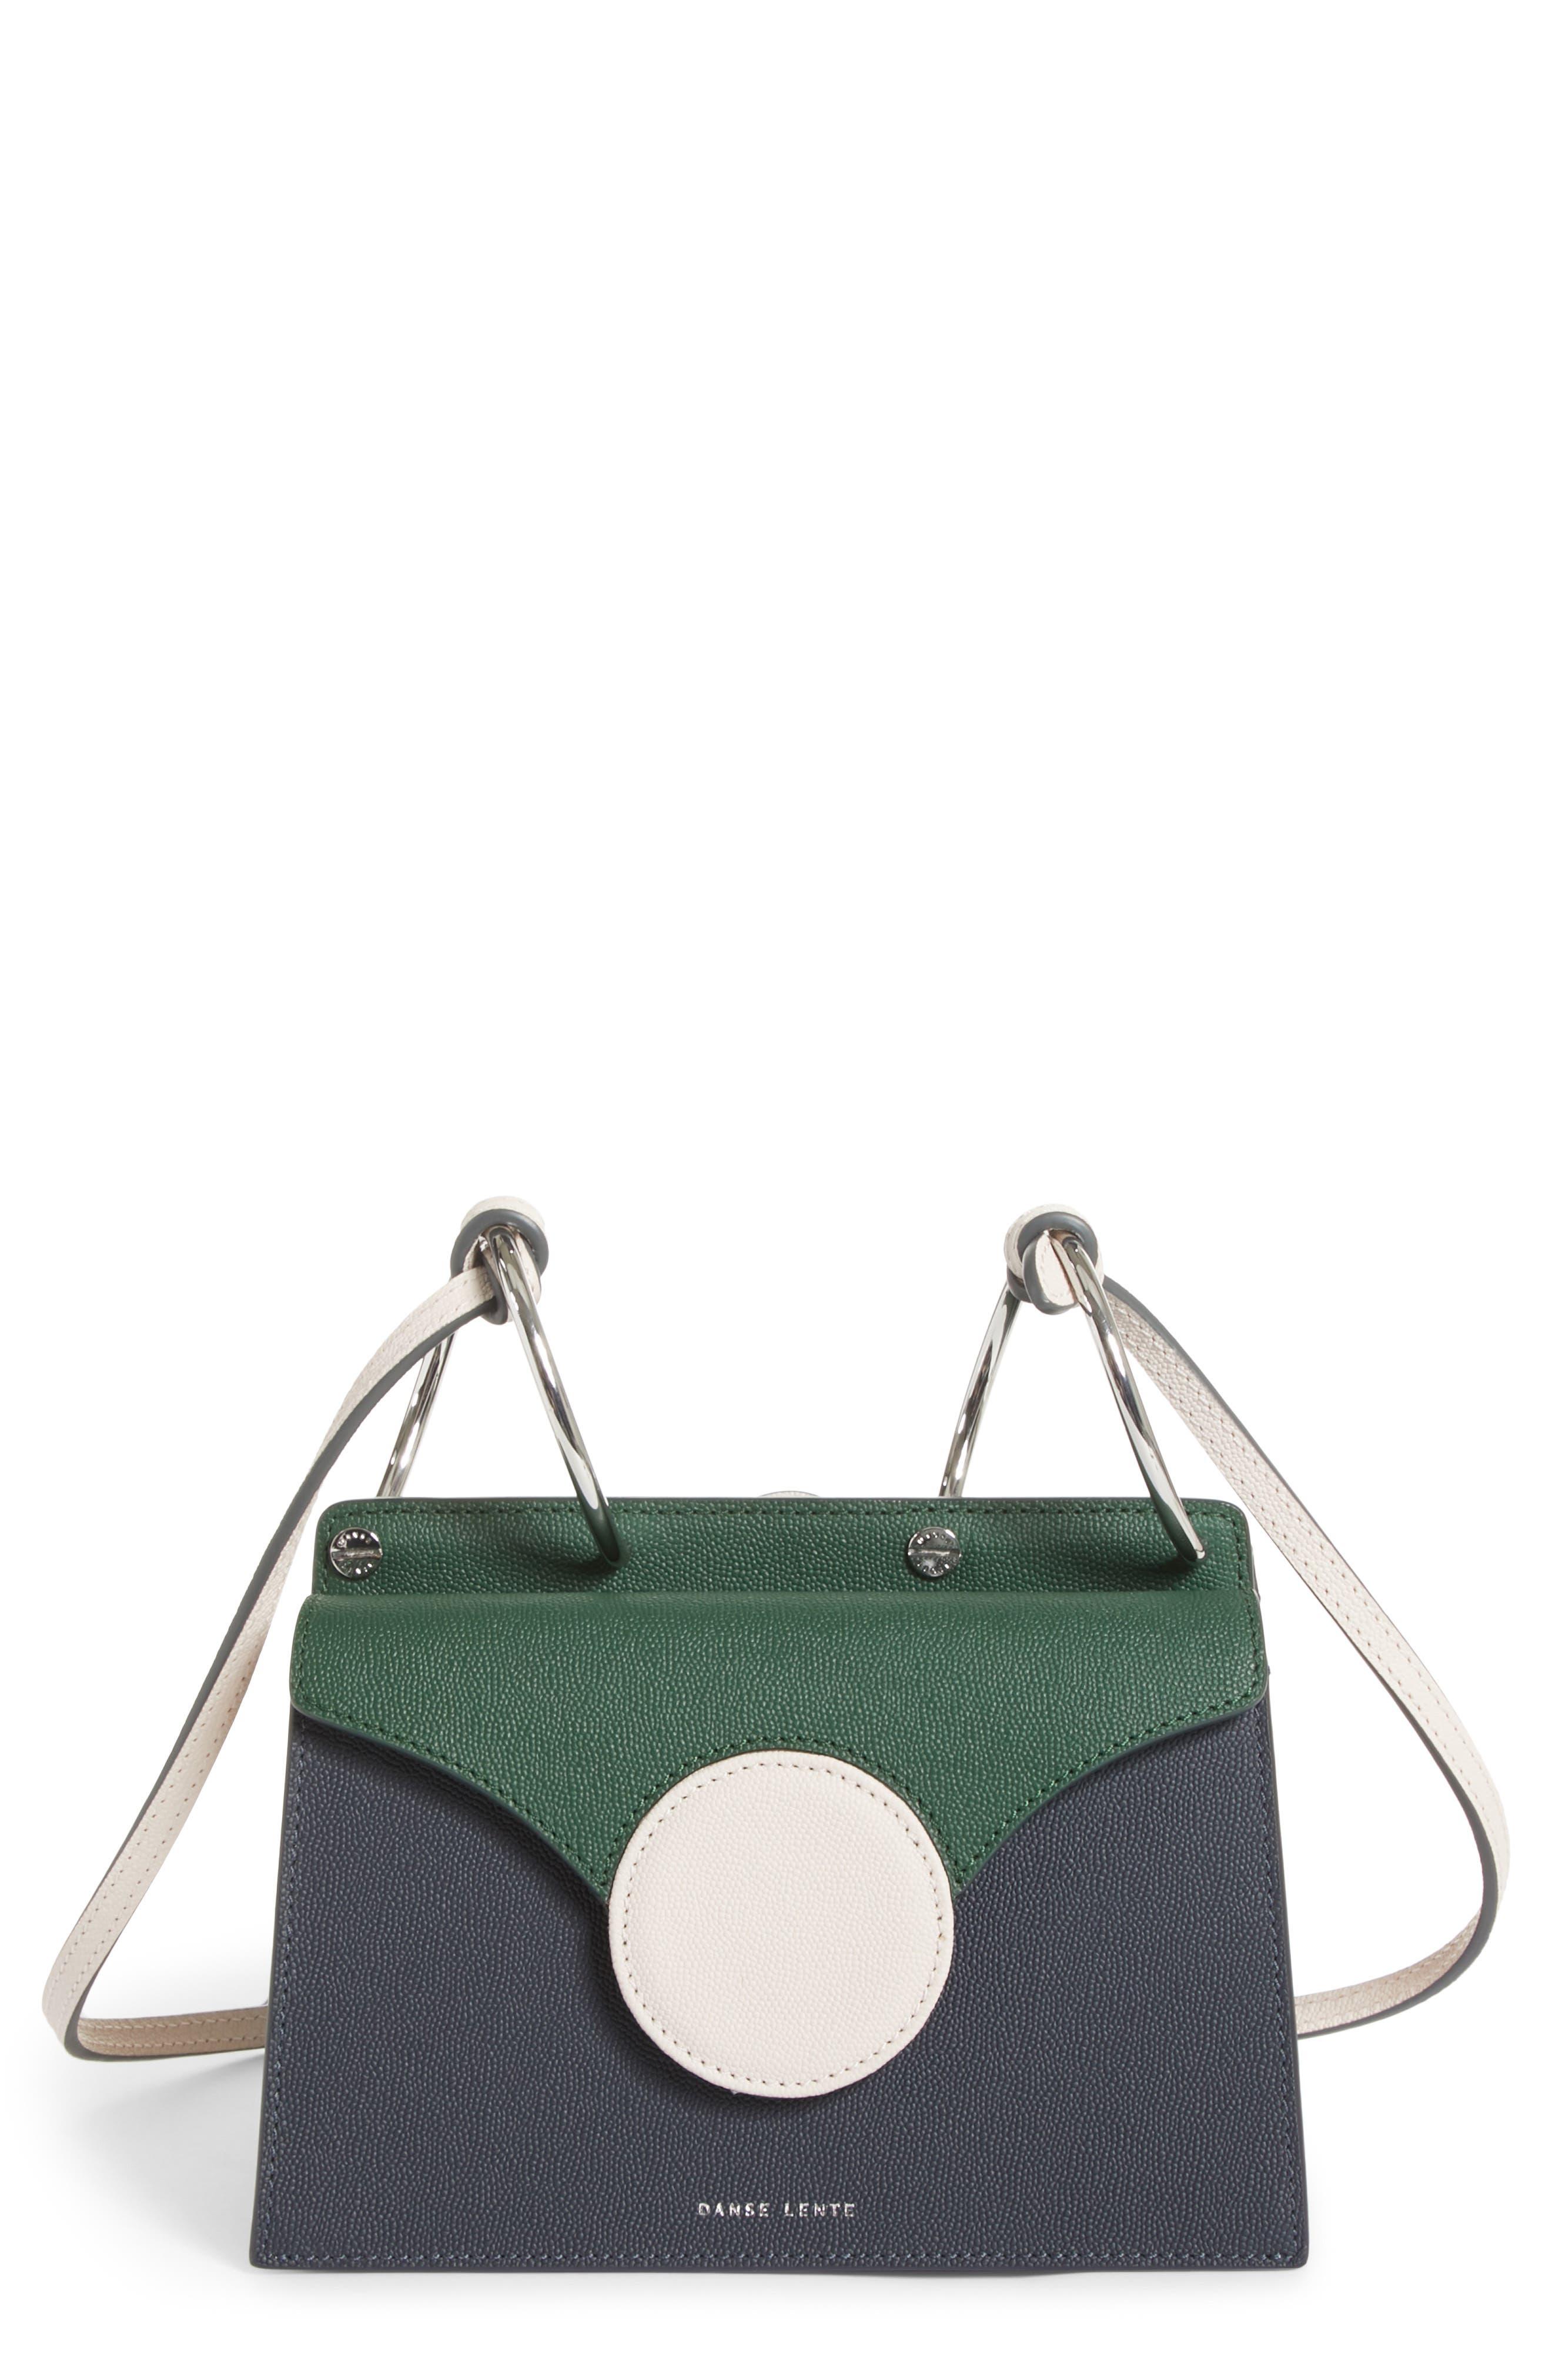 Mini Phoebe Leather Bag,                             Main thumbnail 1, color,                             Pine-Marine